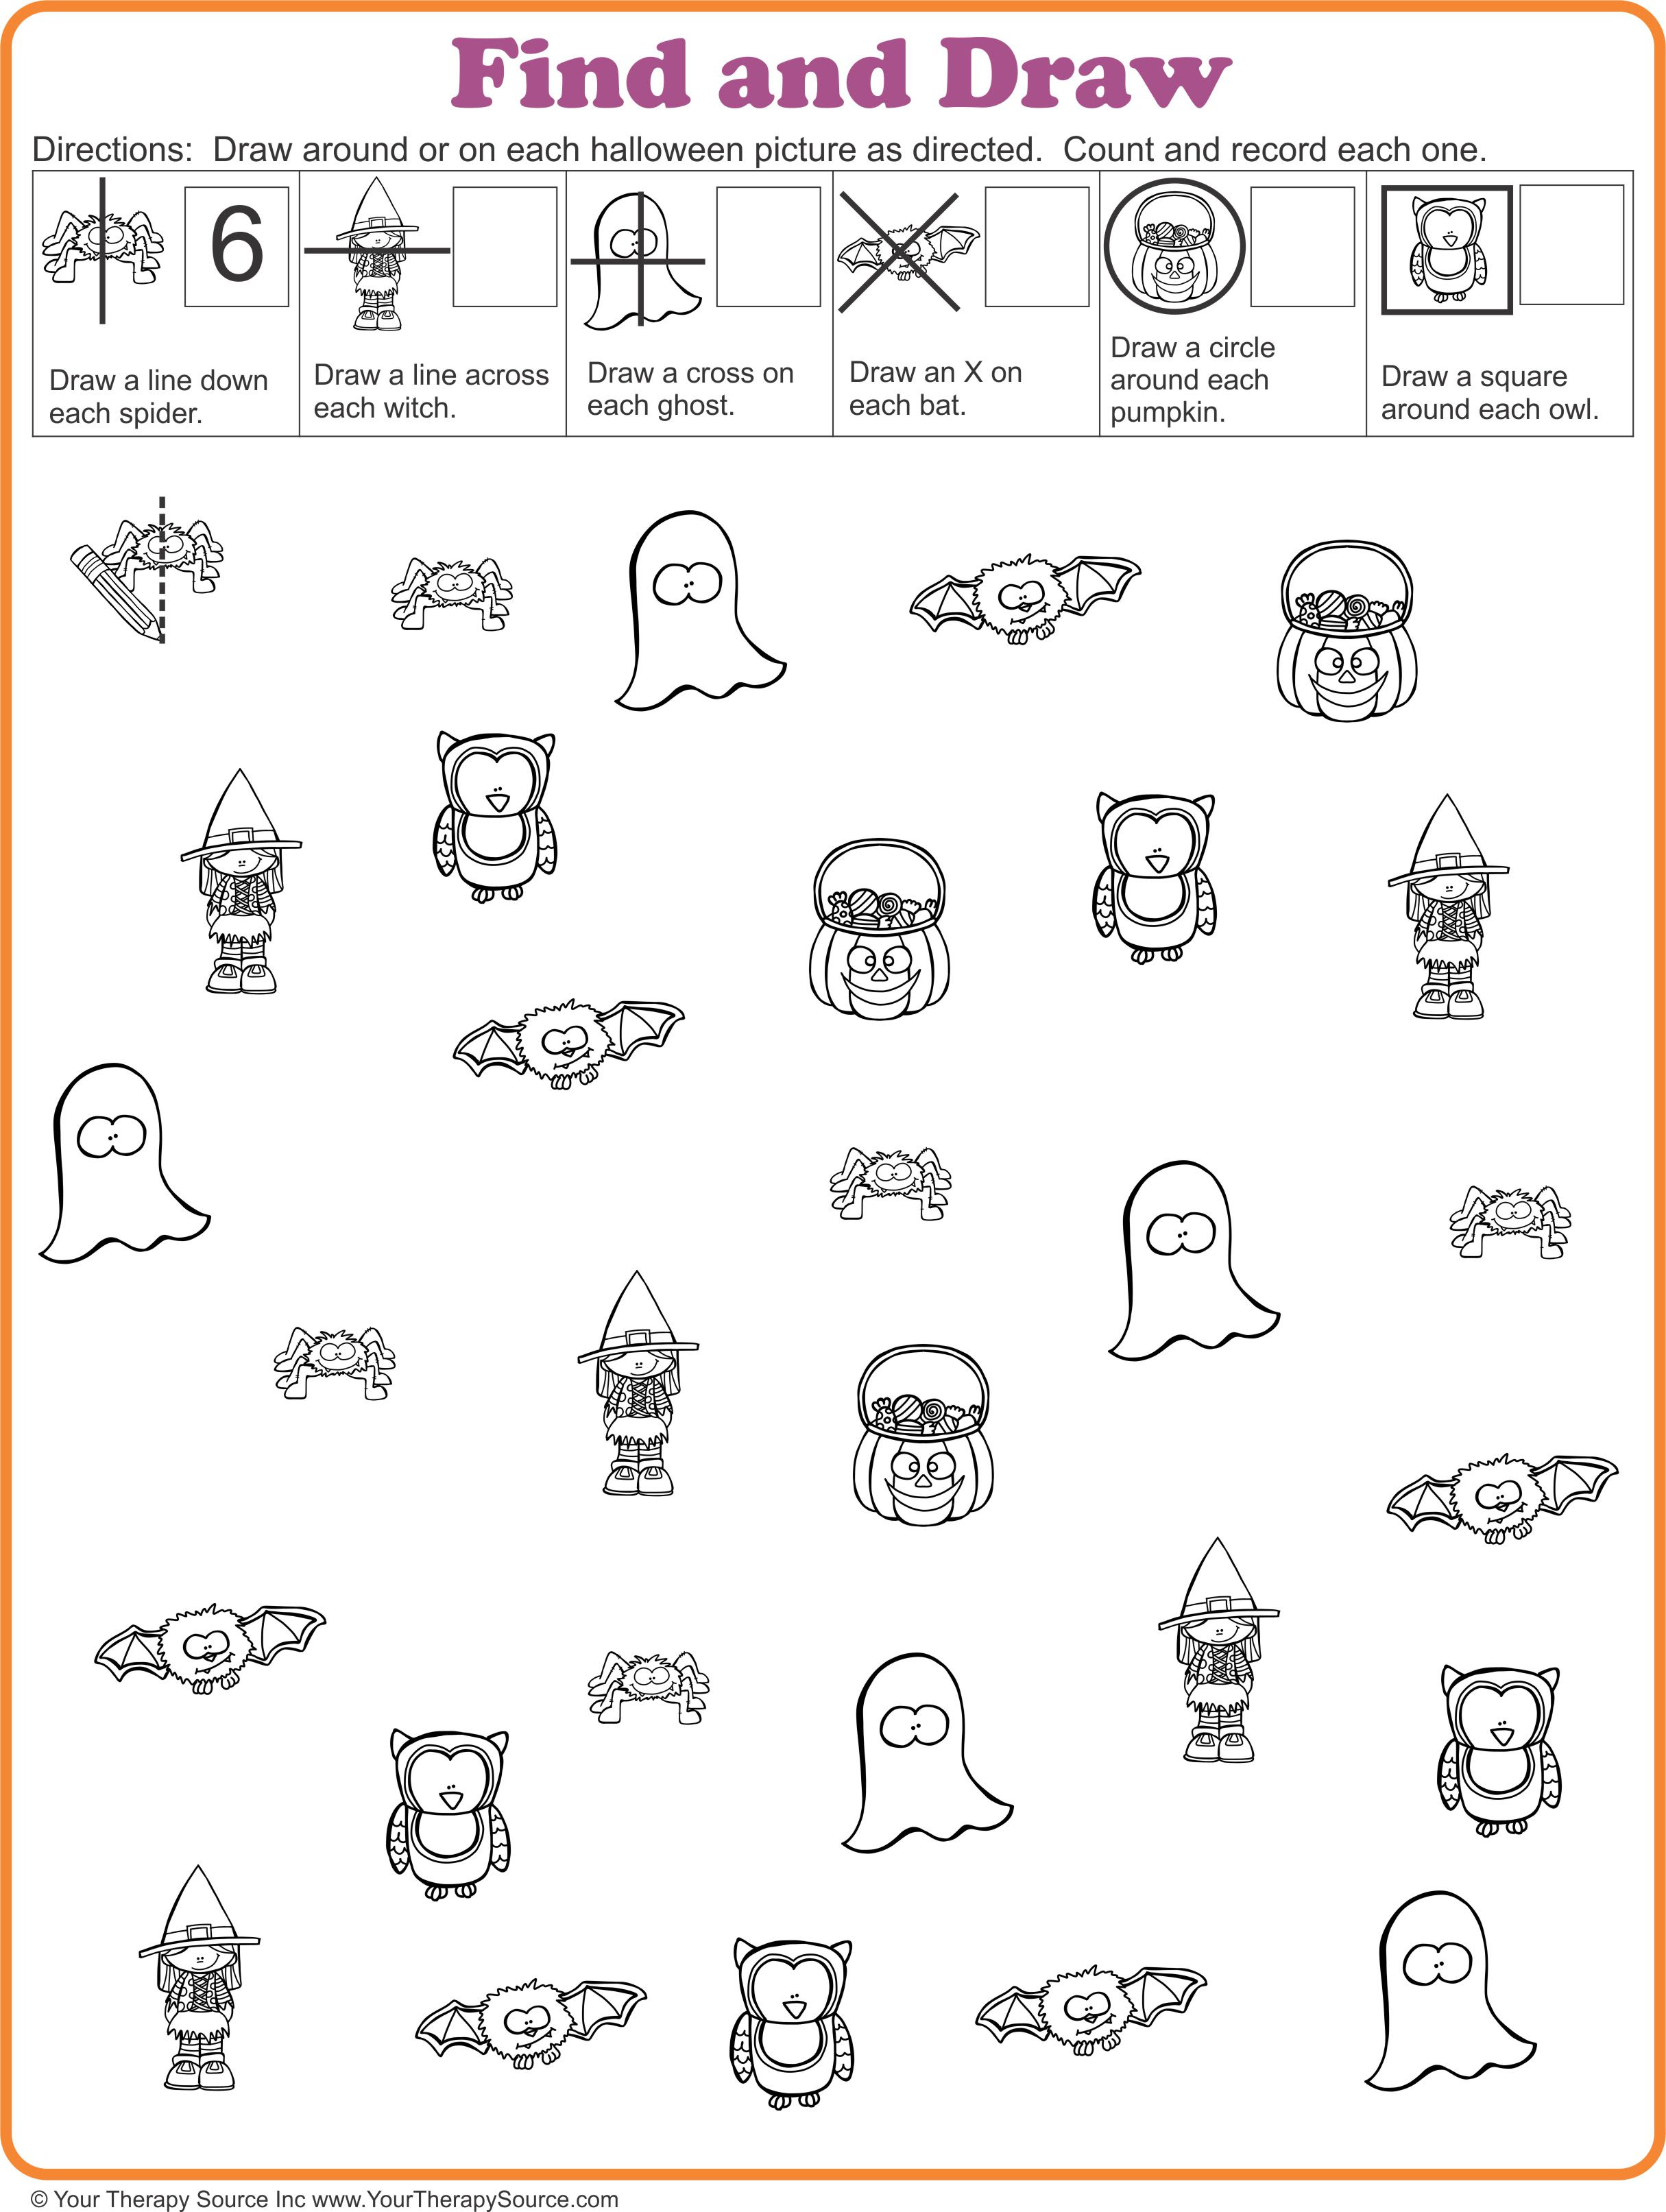 16 FREE Halloween Printables Sensory Motor Skills Your